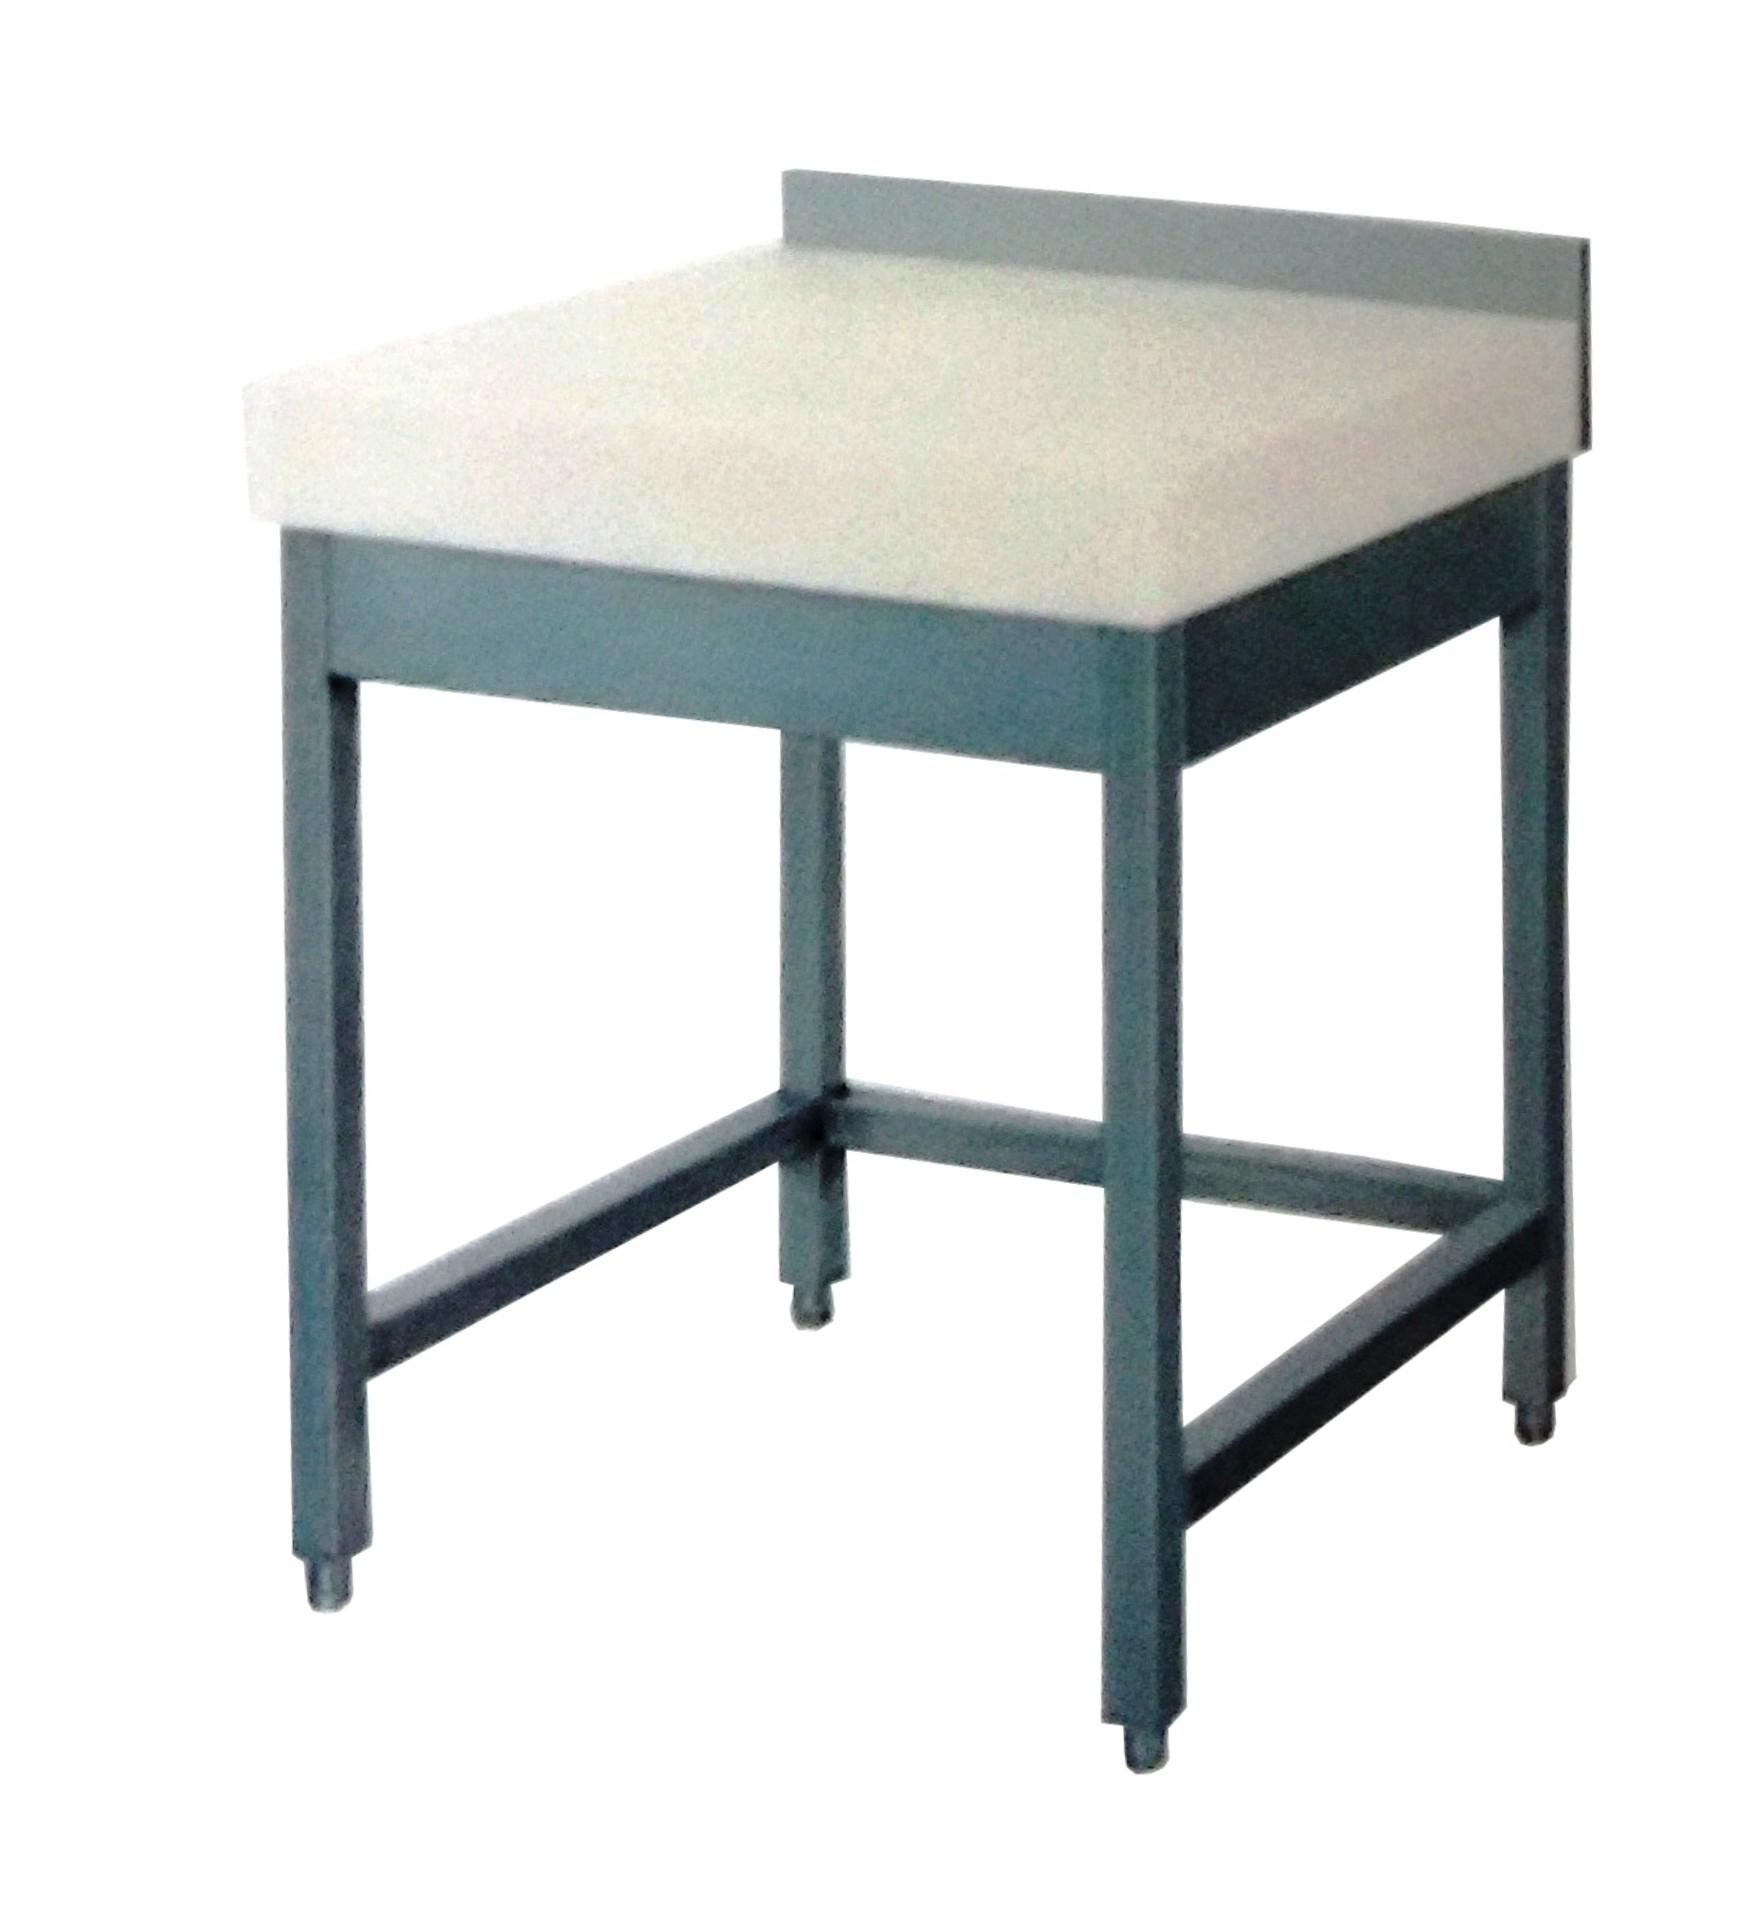 Poliamid Stol